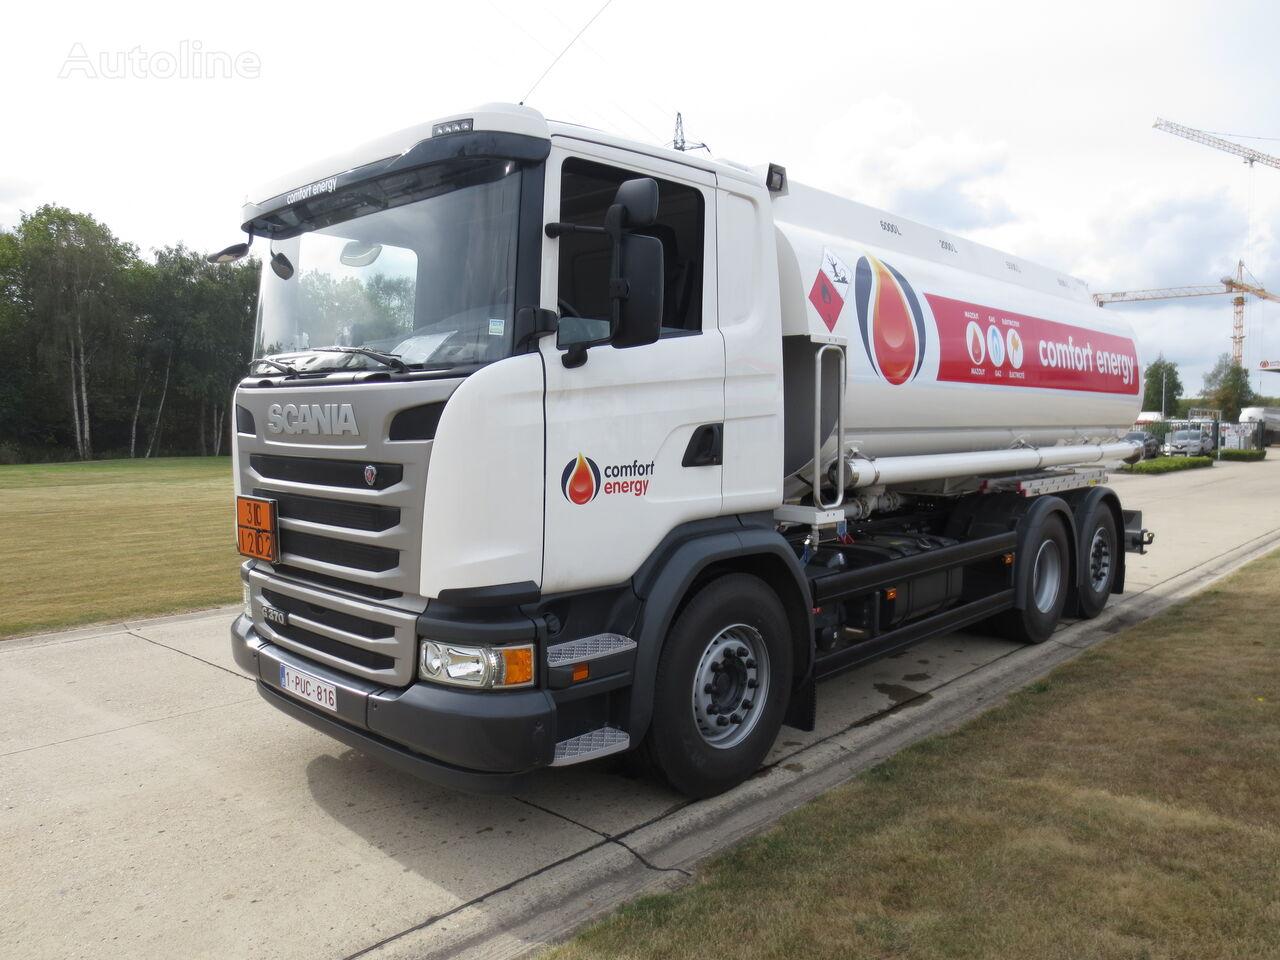 SCANIA kamion cisterna za gorivo